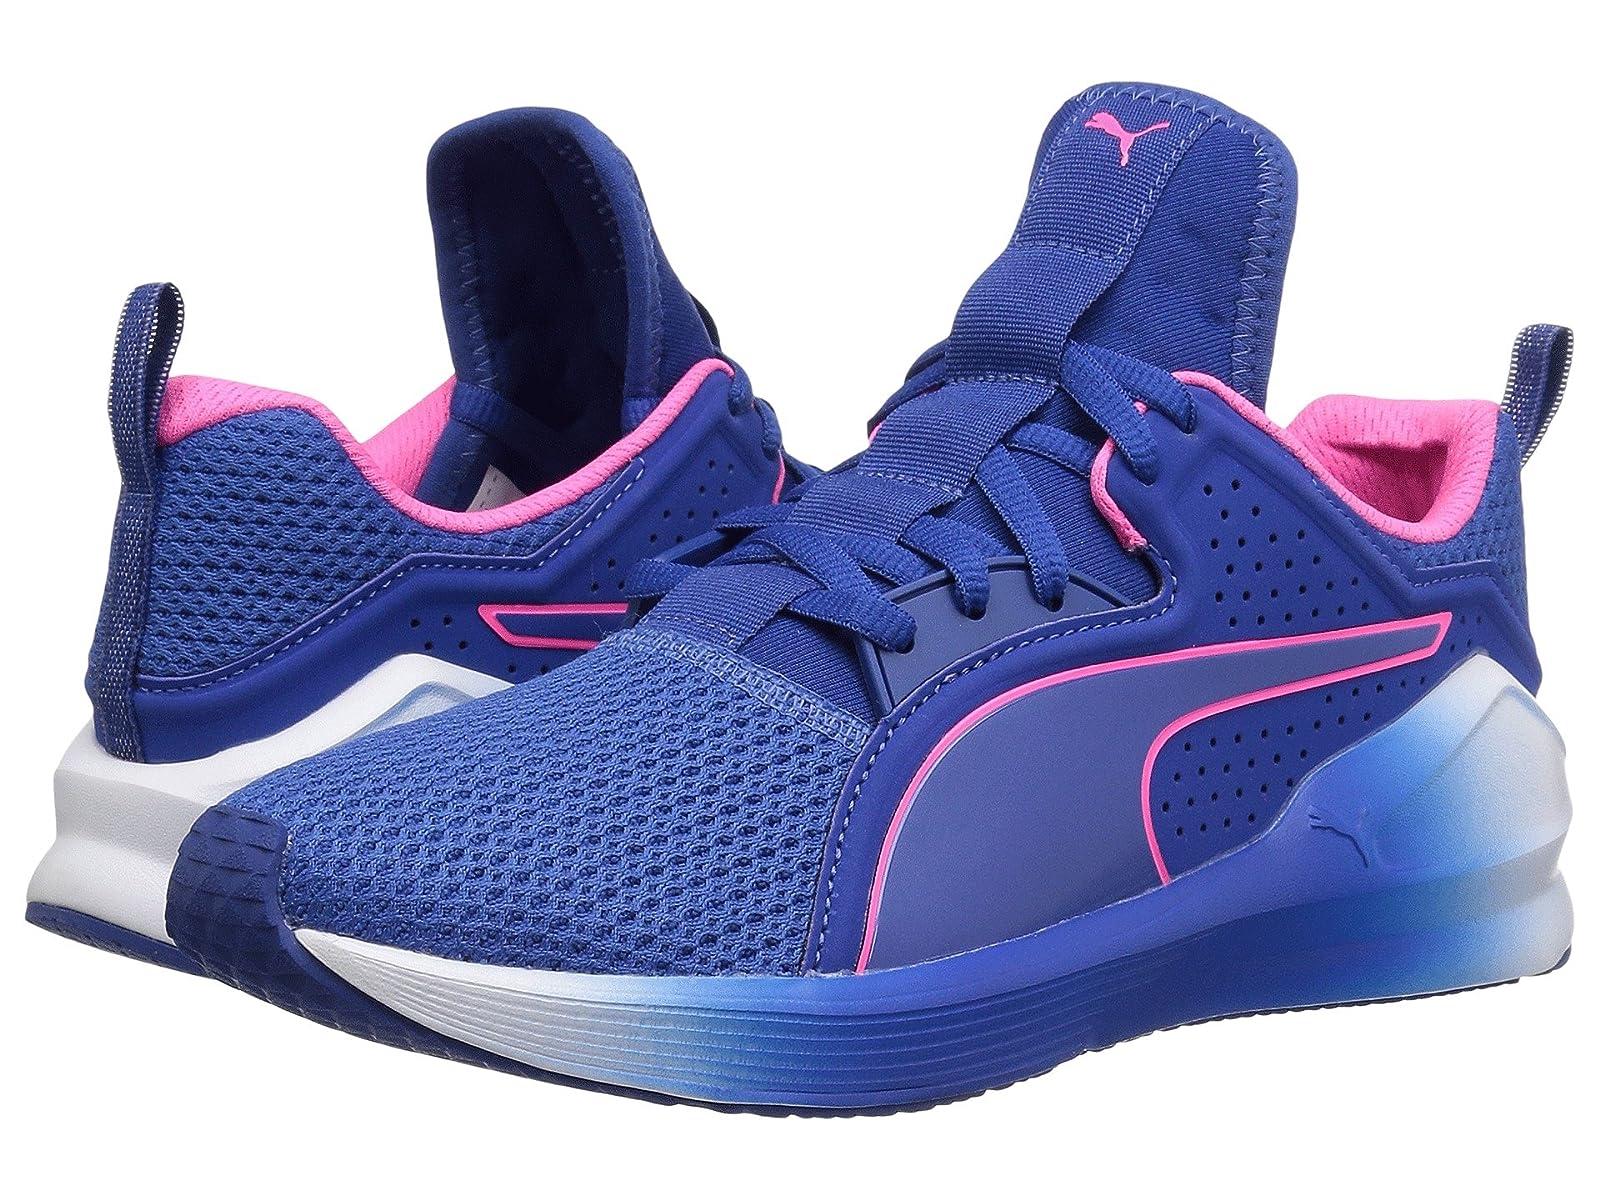 PUMA Fierce LaceCheap and distinctive eye-catching shoes